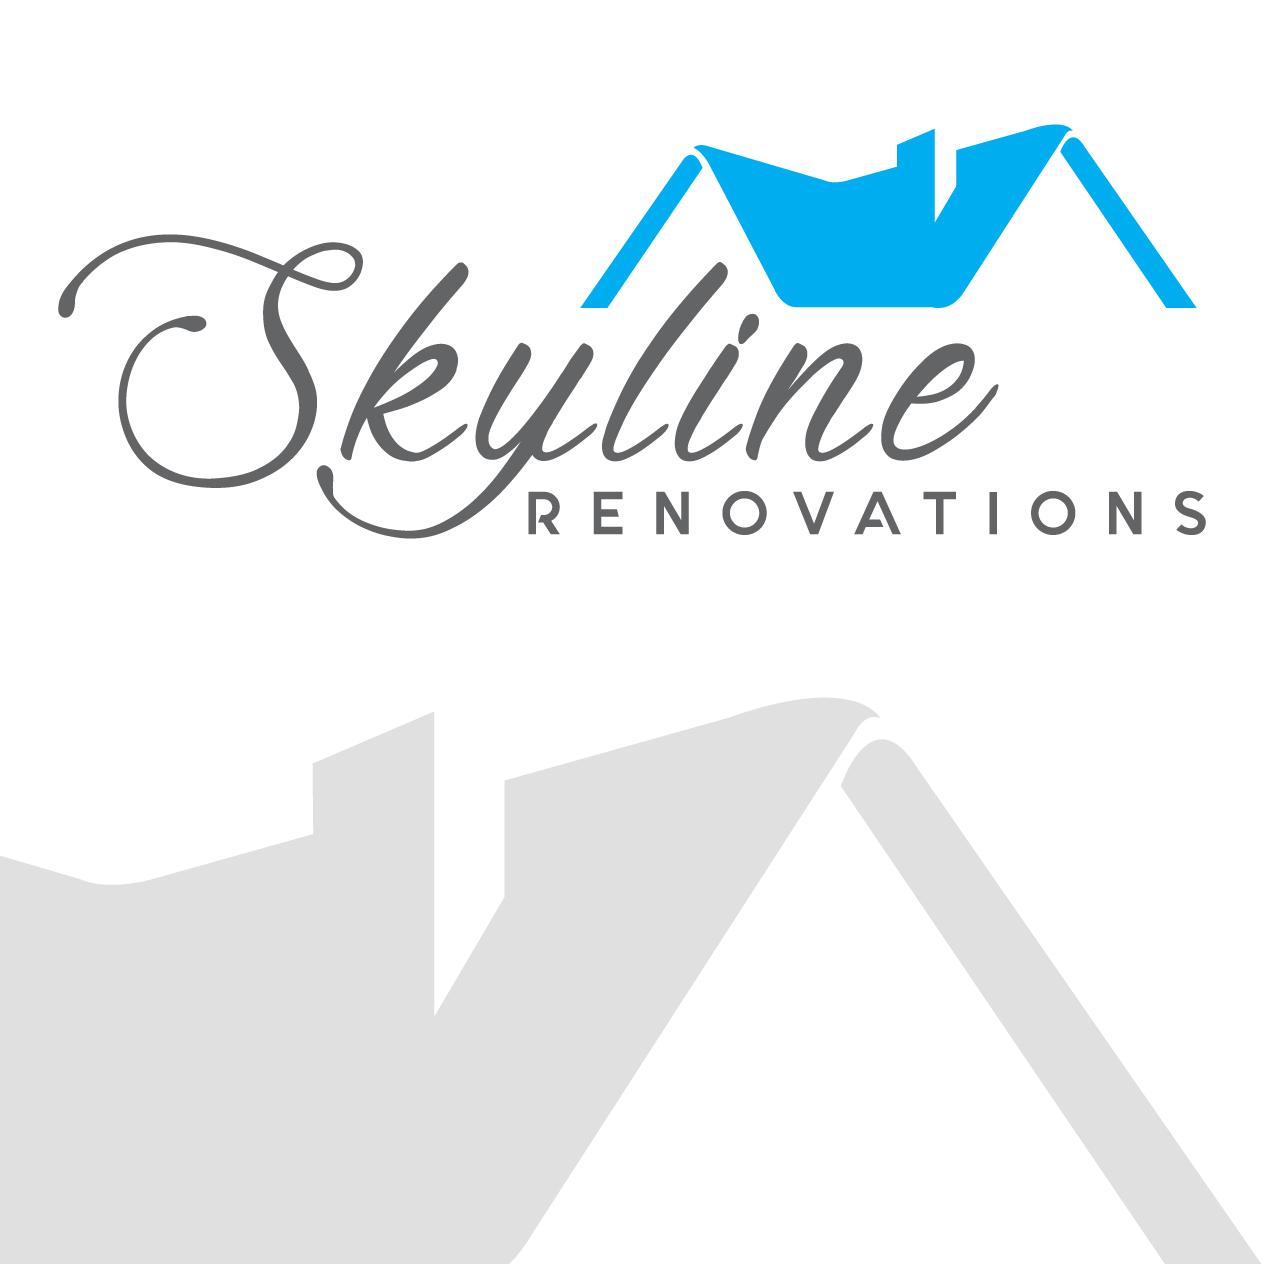 Skyline Renovations logo